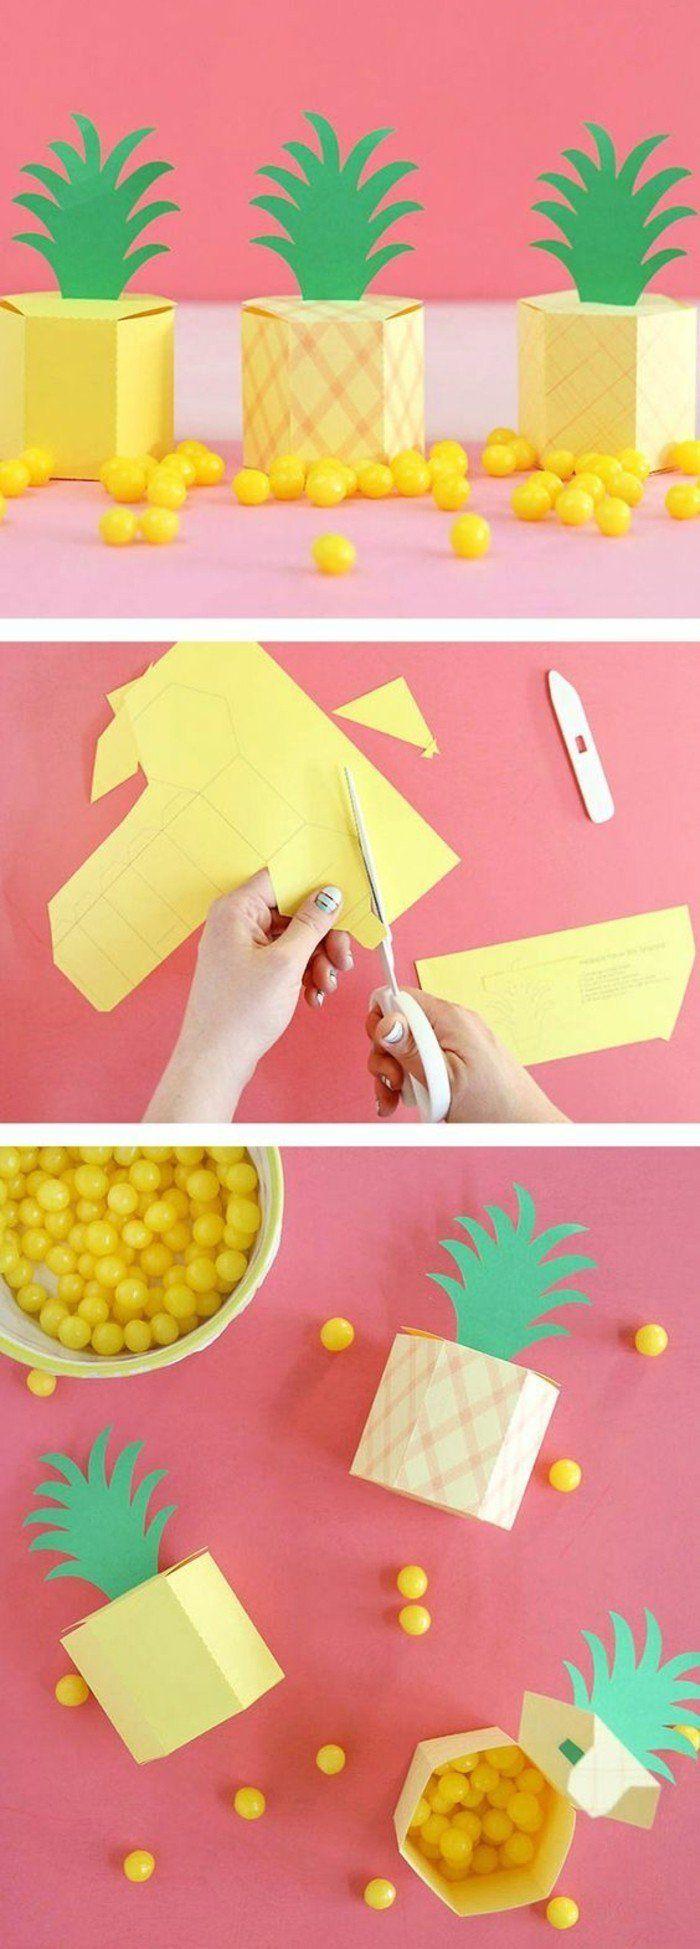 1001 id es comment faire une bo te en papier origami craft and ideas para. Black Bedroom Furniture Sets. Home Design Ideas